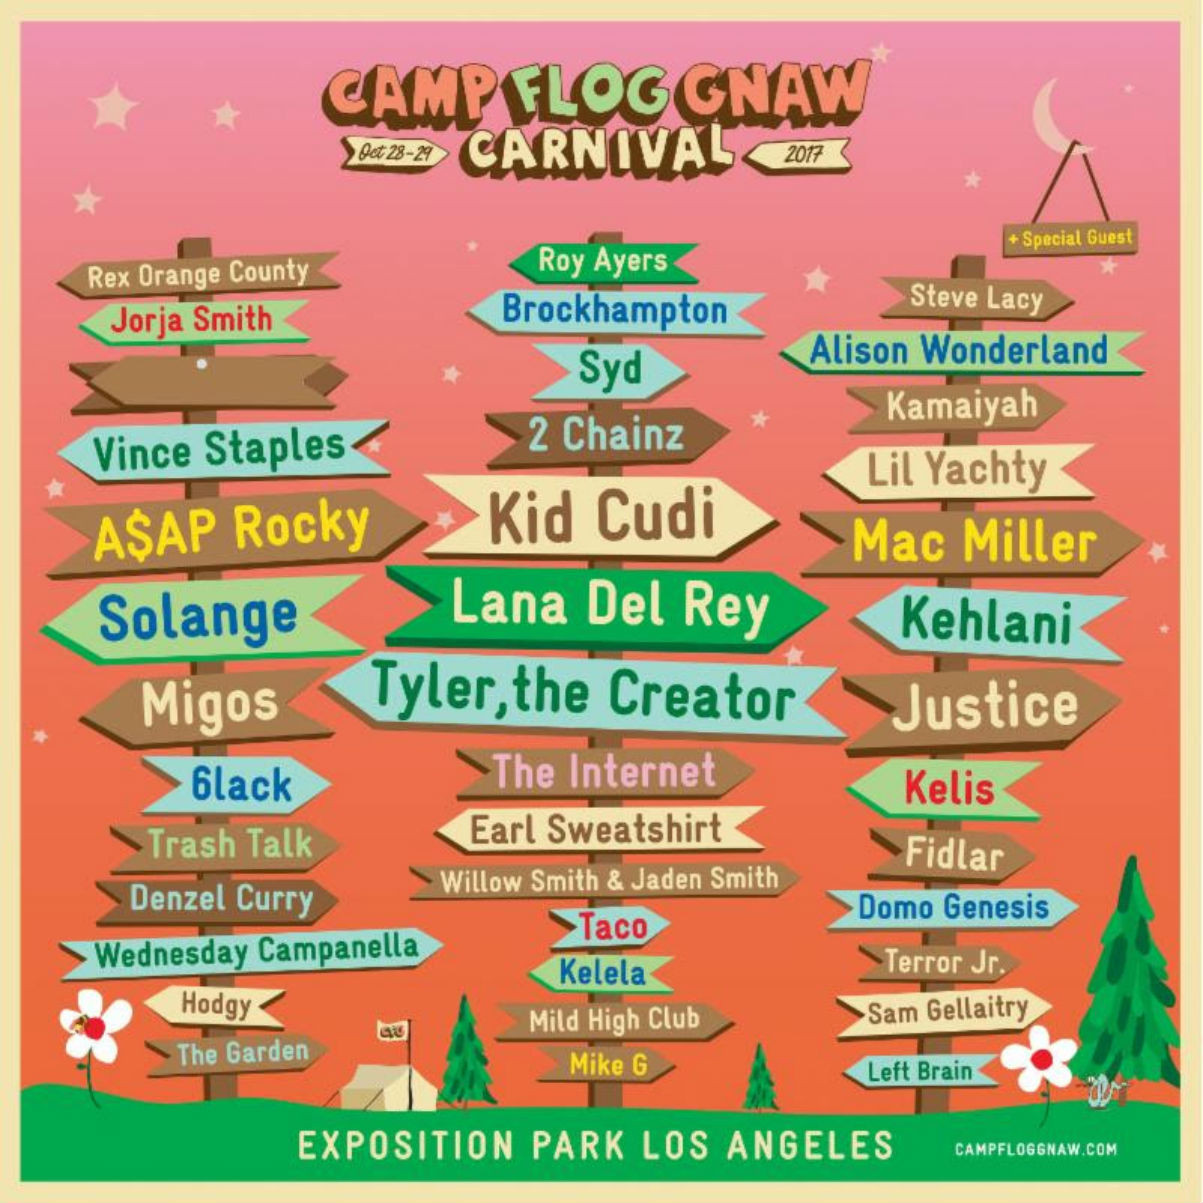 Camp Flog Gnaw Carnival 2017 Lineup Flyer Tyler ASAP Rocky Lana Del Rey